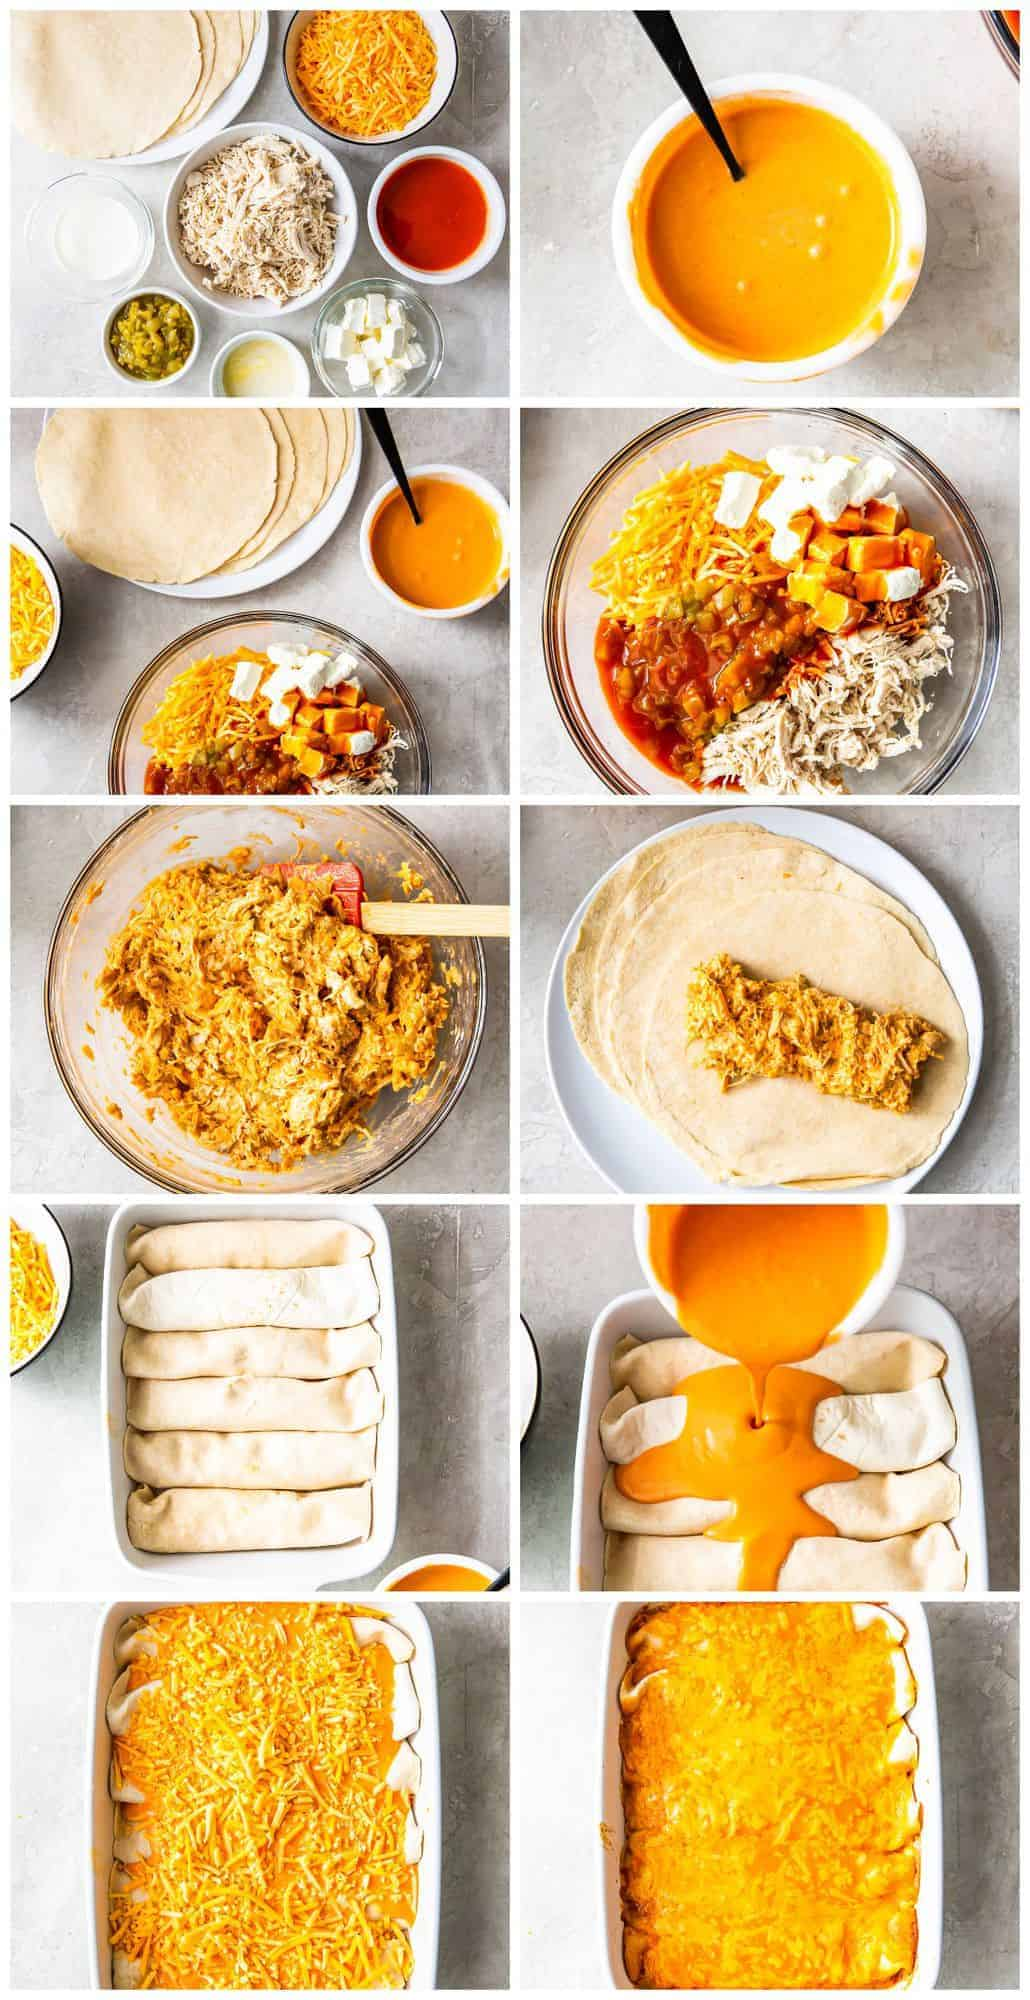 step by step photos for how to make buffalo chicken enchiladas